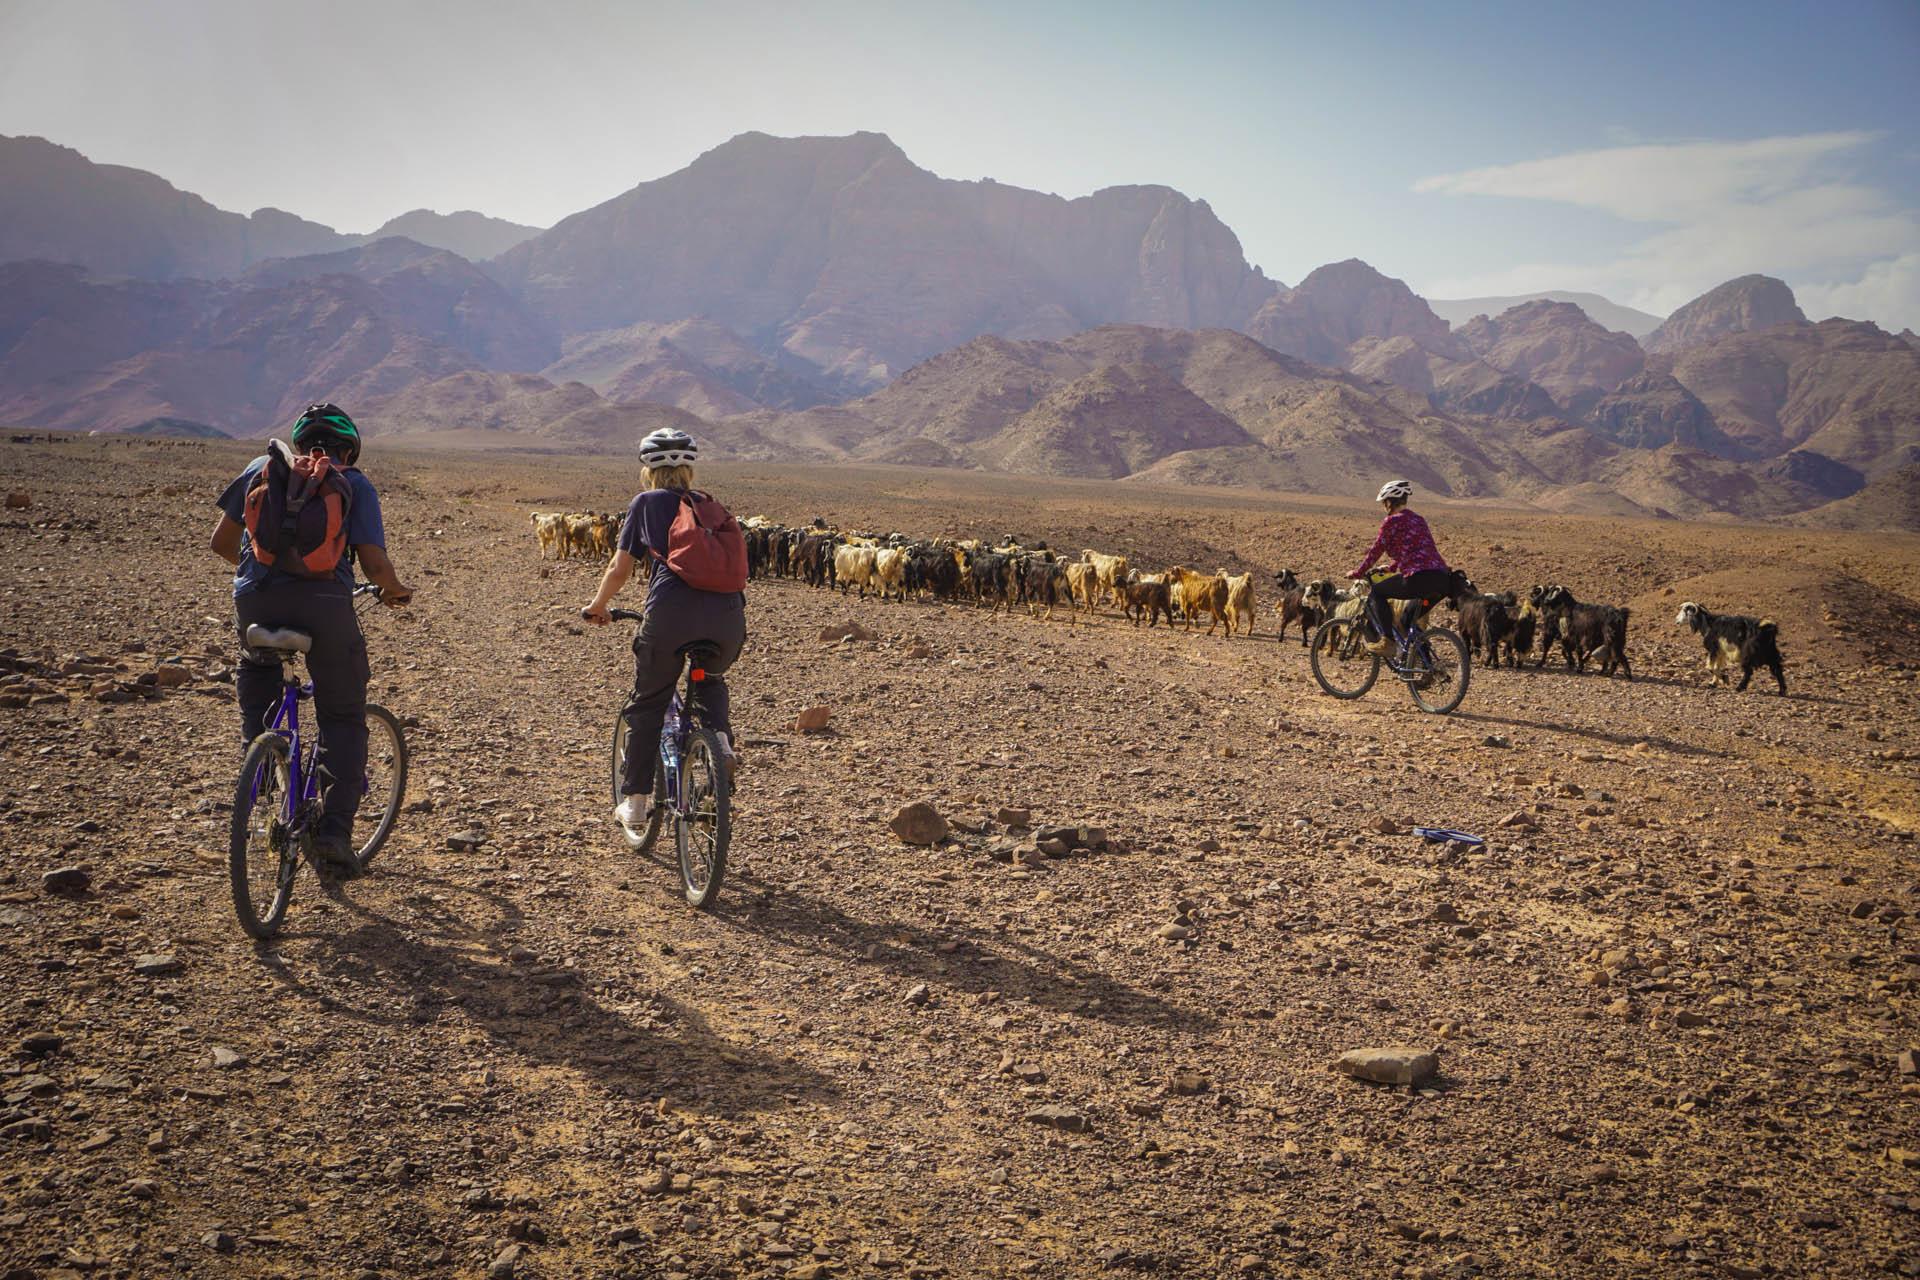 Optional mountain biking